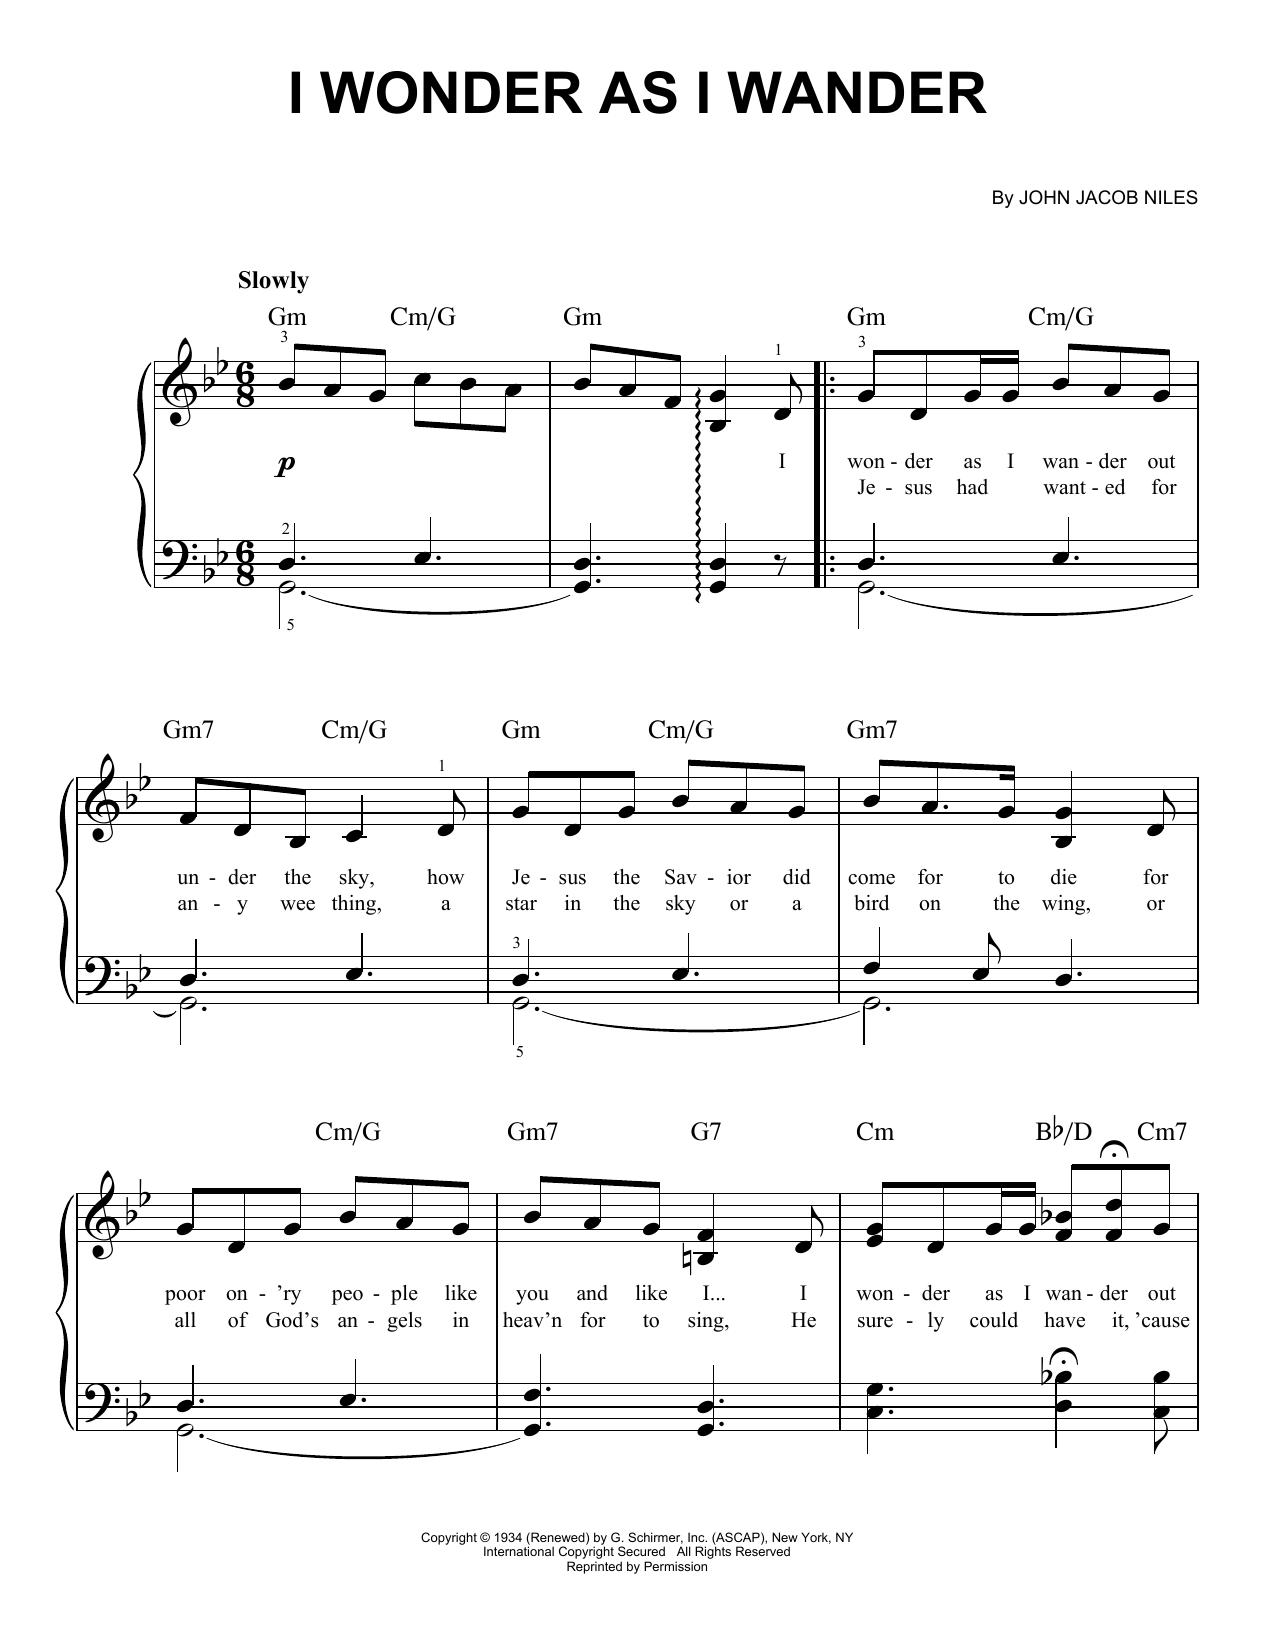 John Jacob Niles I Wonder As I Wander sheet music notes and chords. Download Printable PDF.